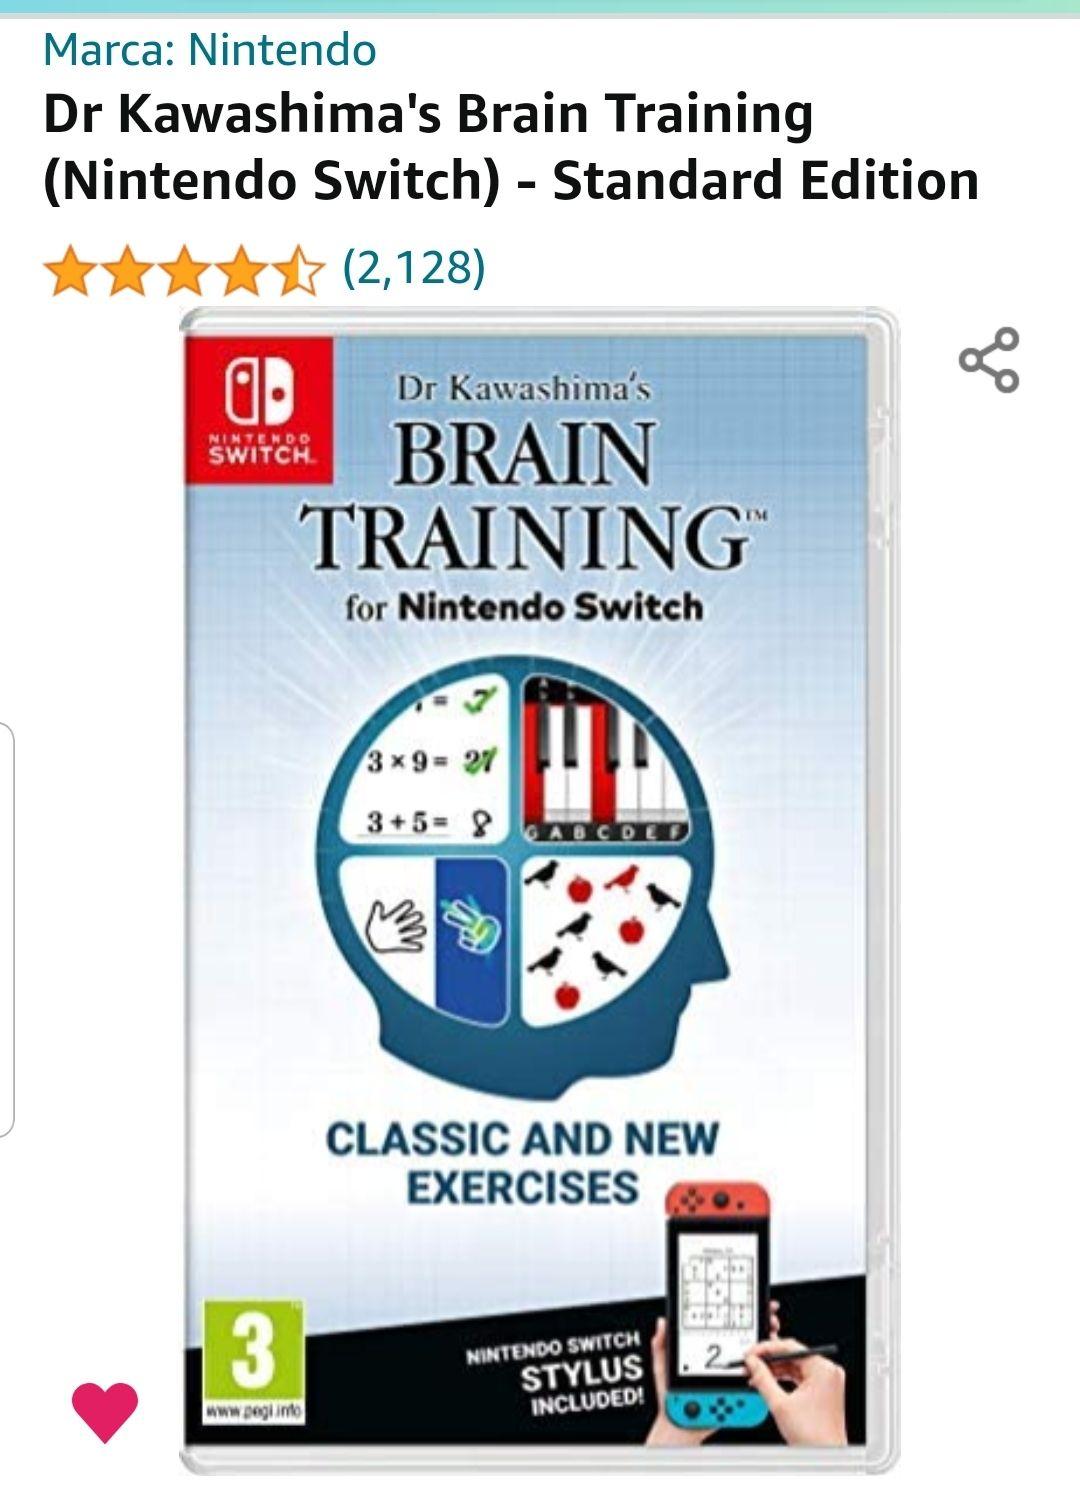 AMAZON: Dr Kawashima's Brain Training (Nintendo Switch) - Standard Edition